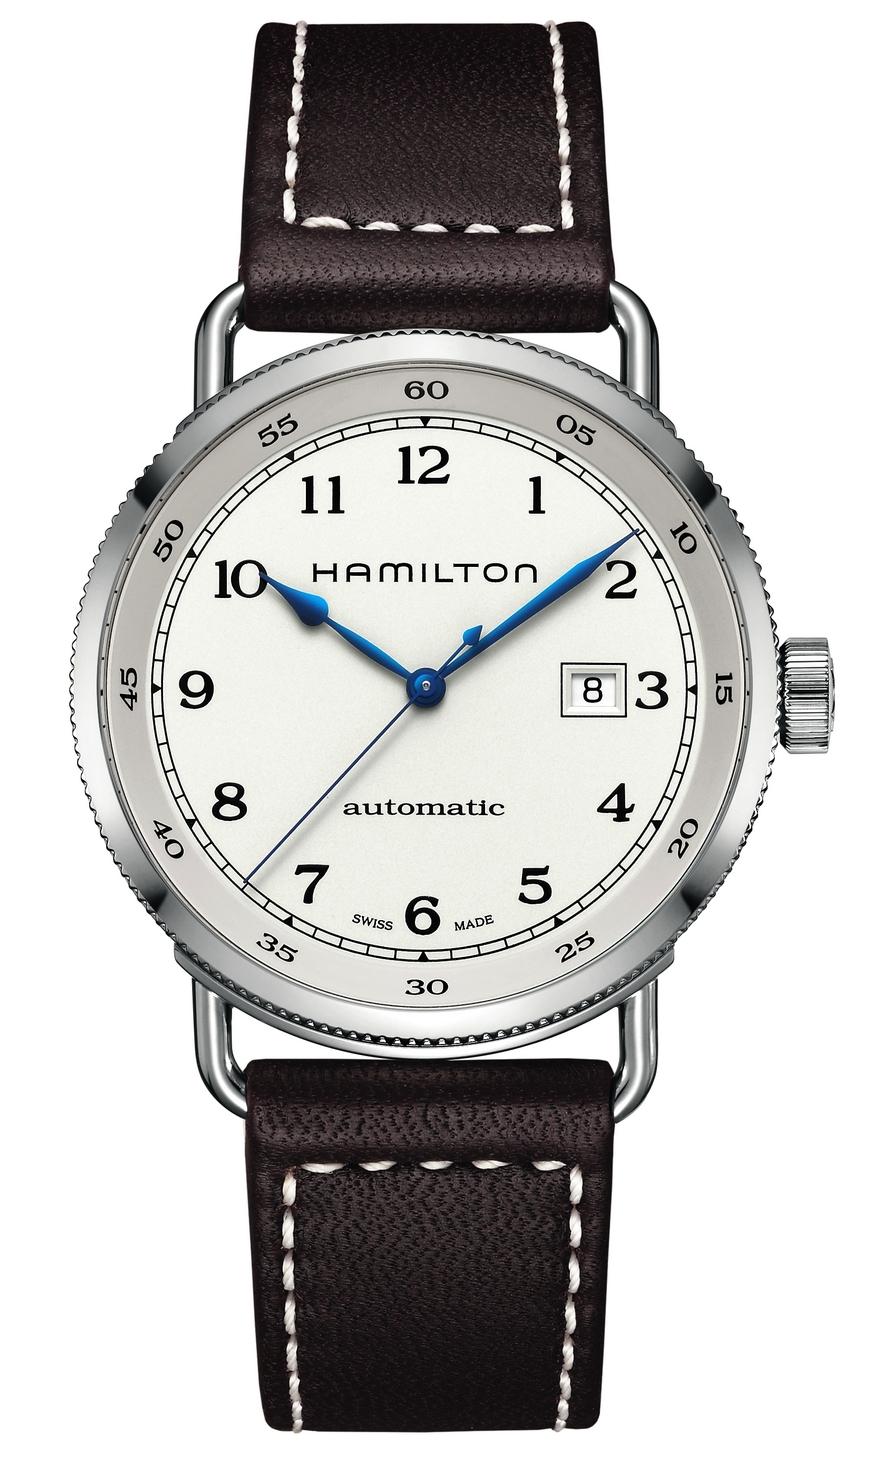 Hamilton-Khaki-Navy-Pioneer-H77715553_Original_11291